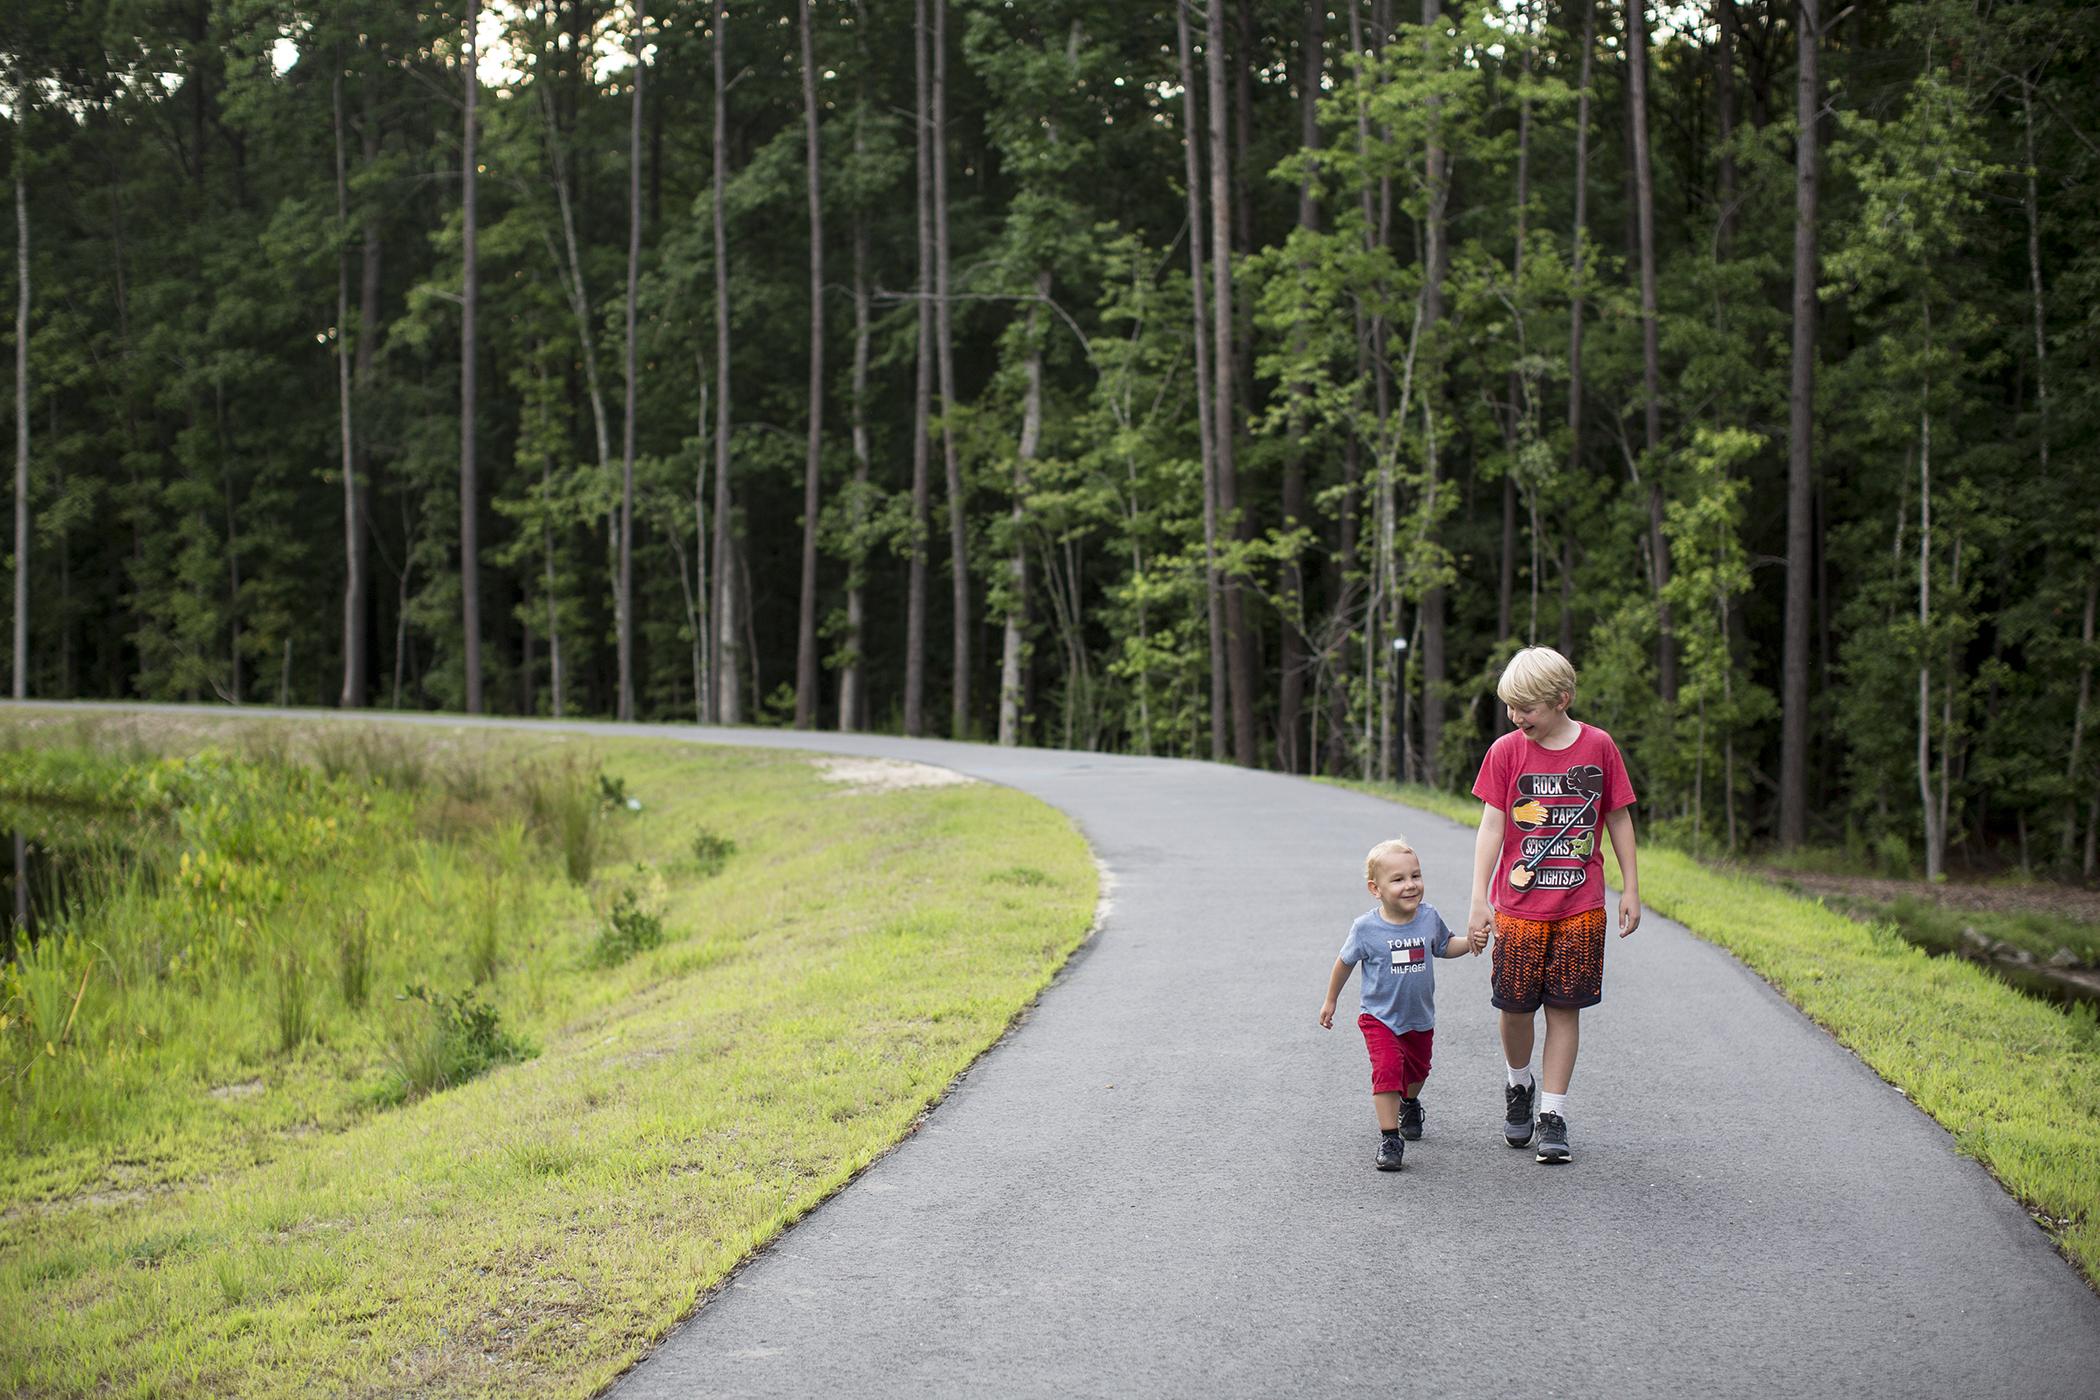 Residents enjoy taking walks around Nature Park in Apex, NC